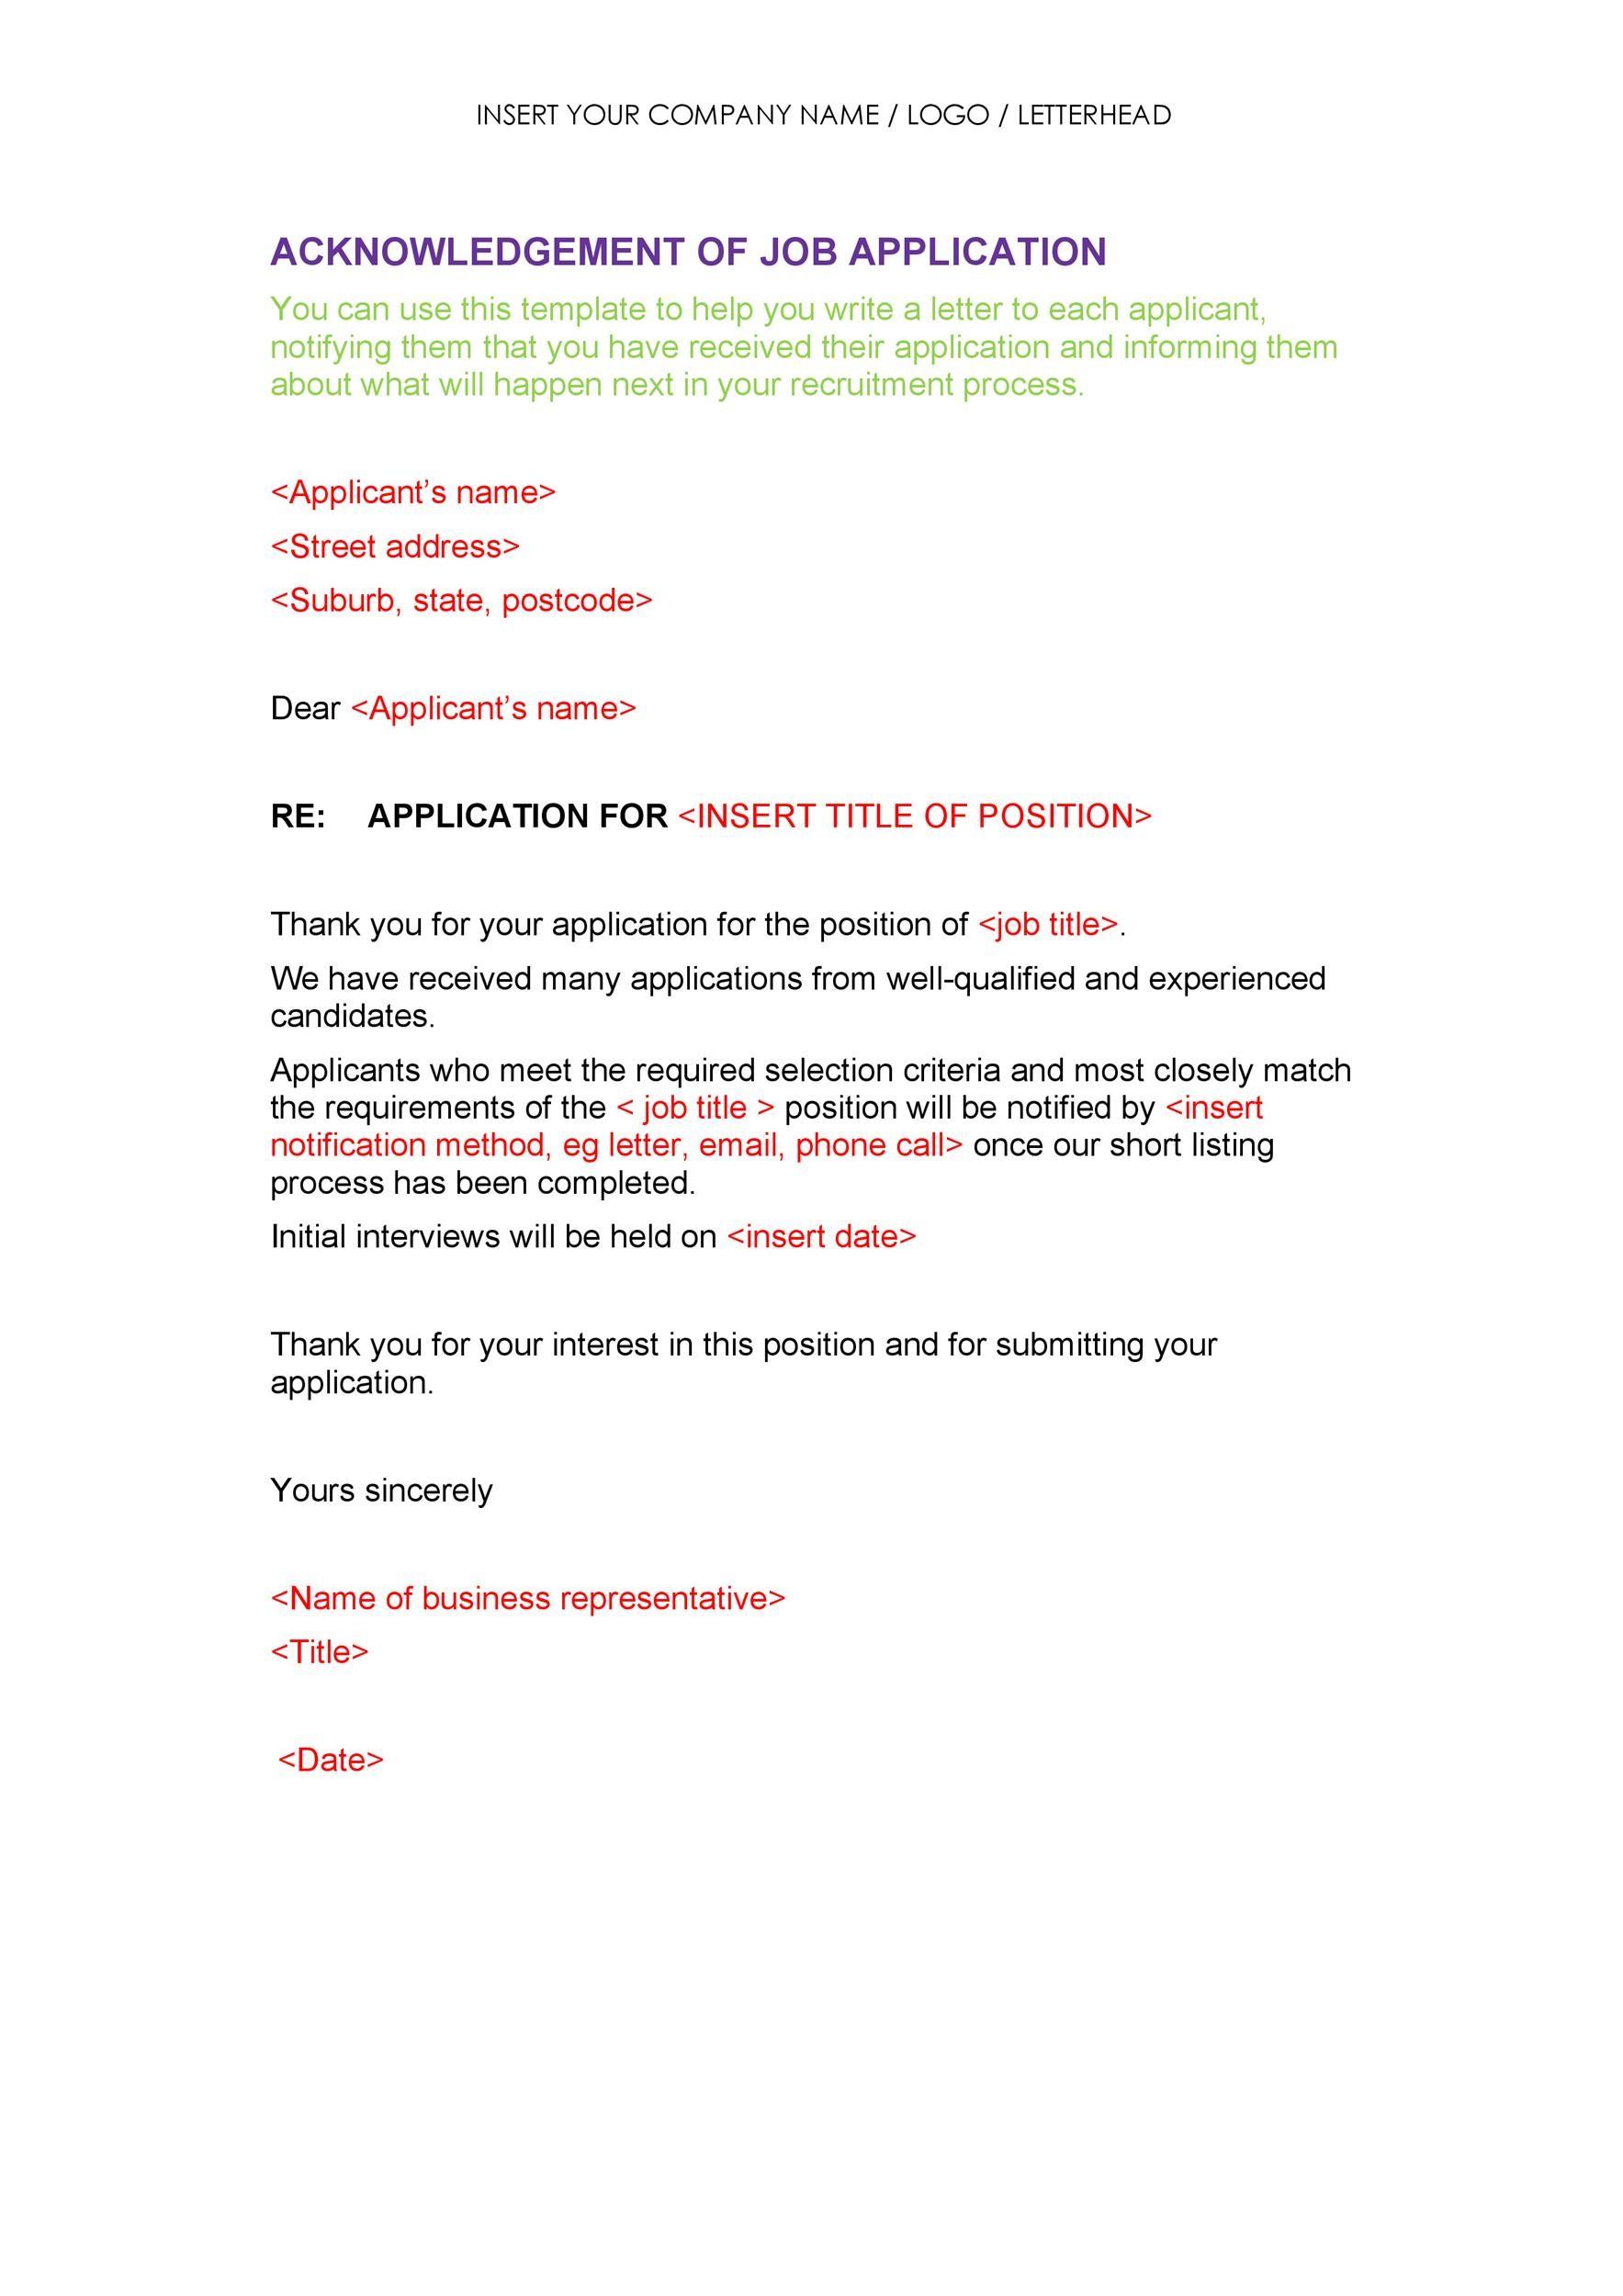 Free acknowledgement sample 18